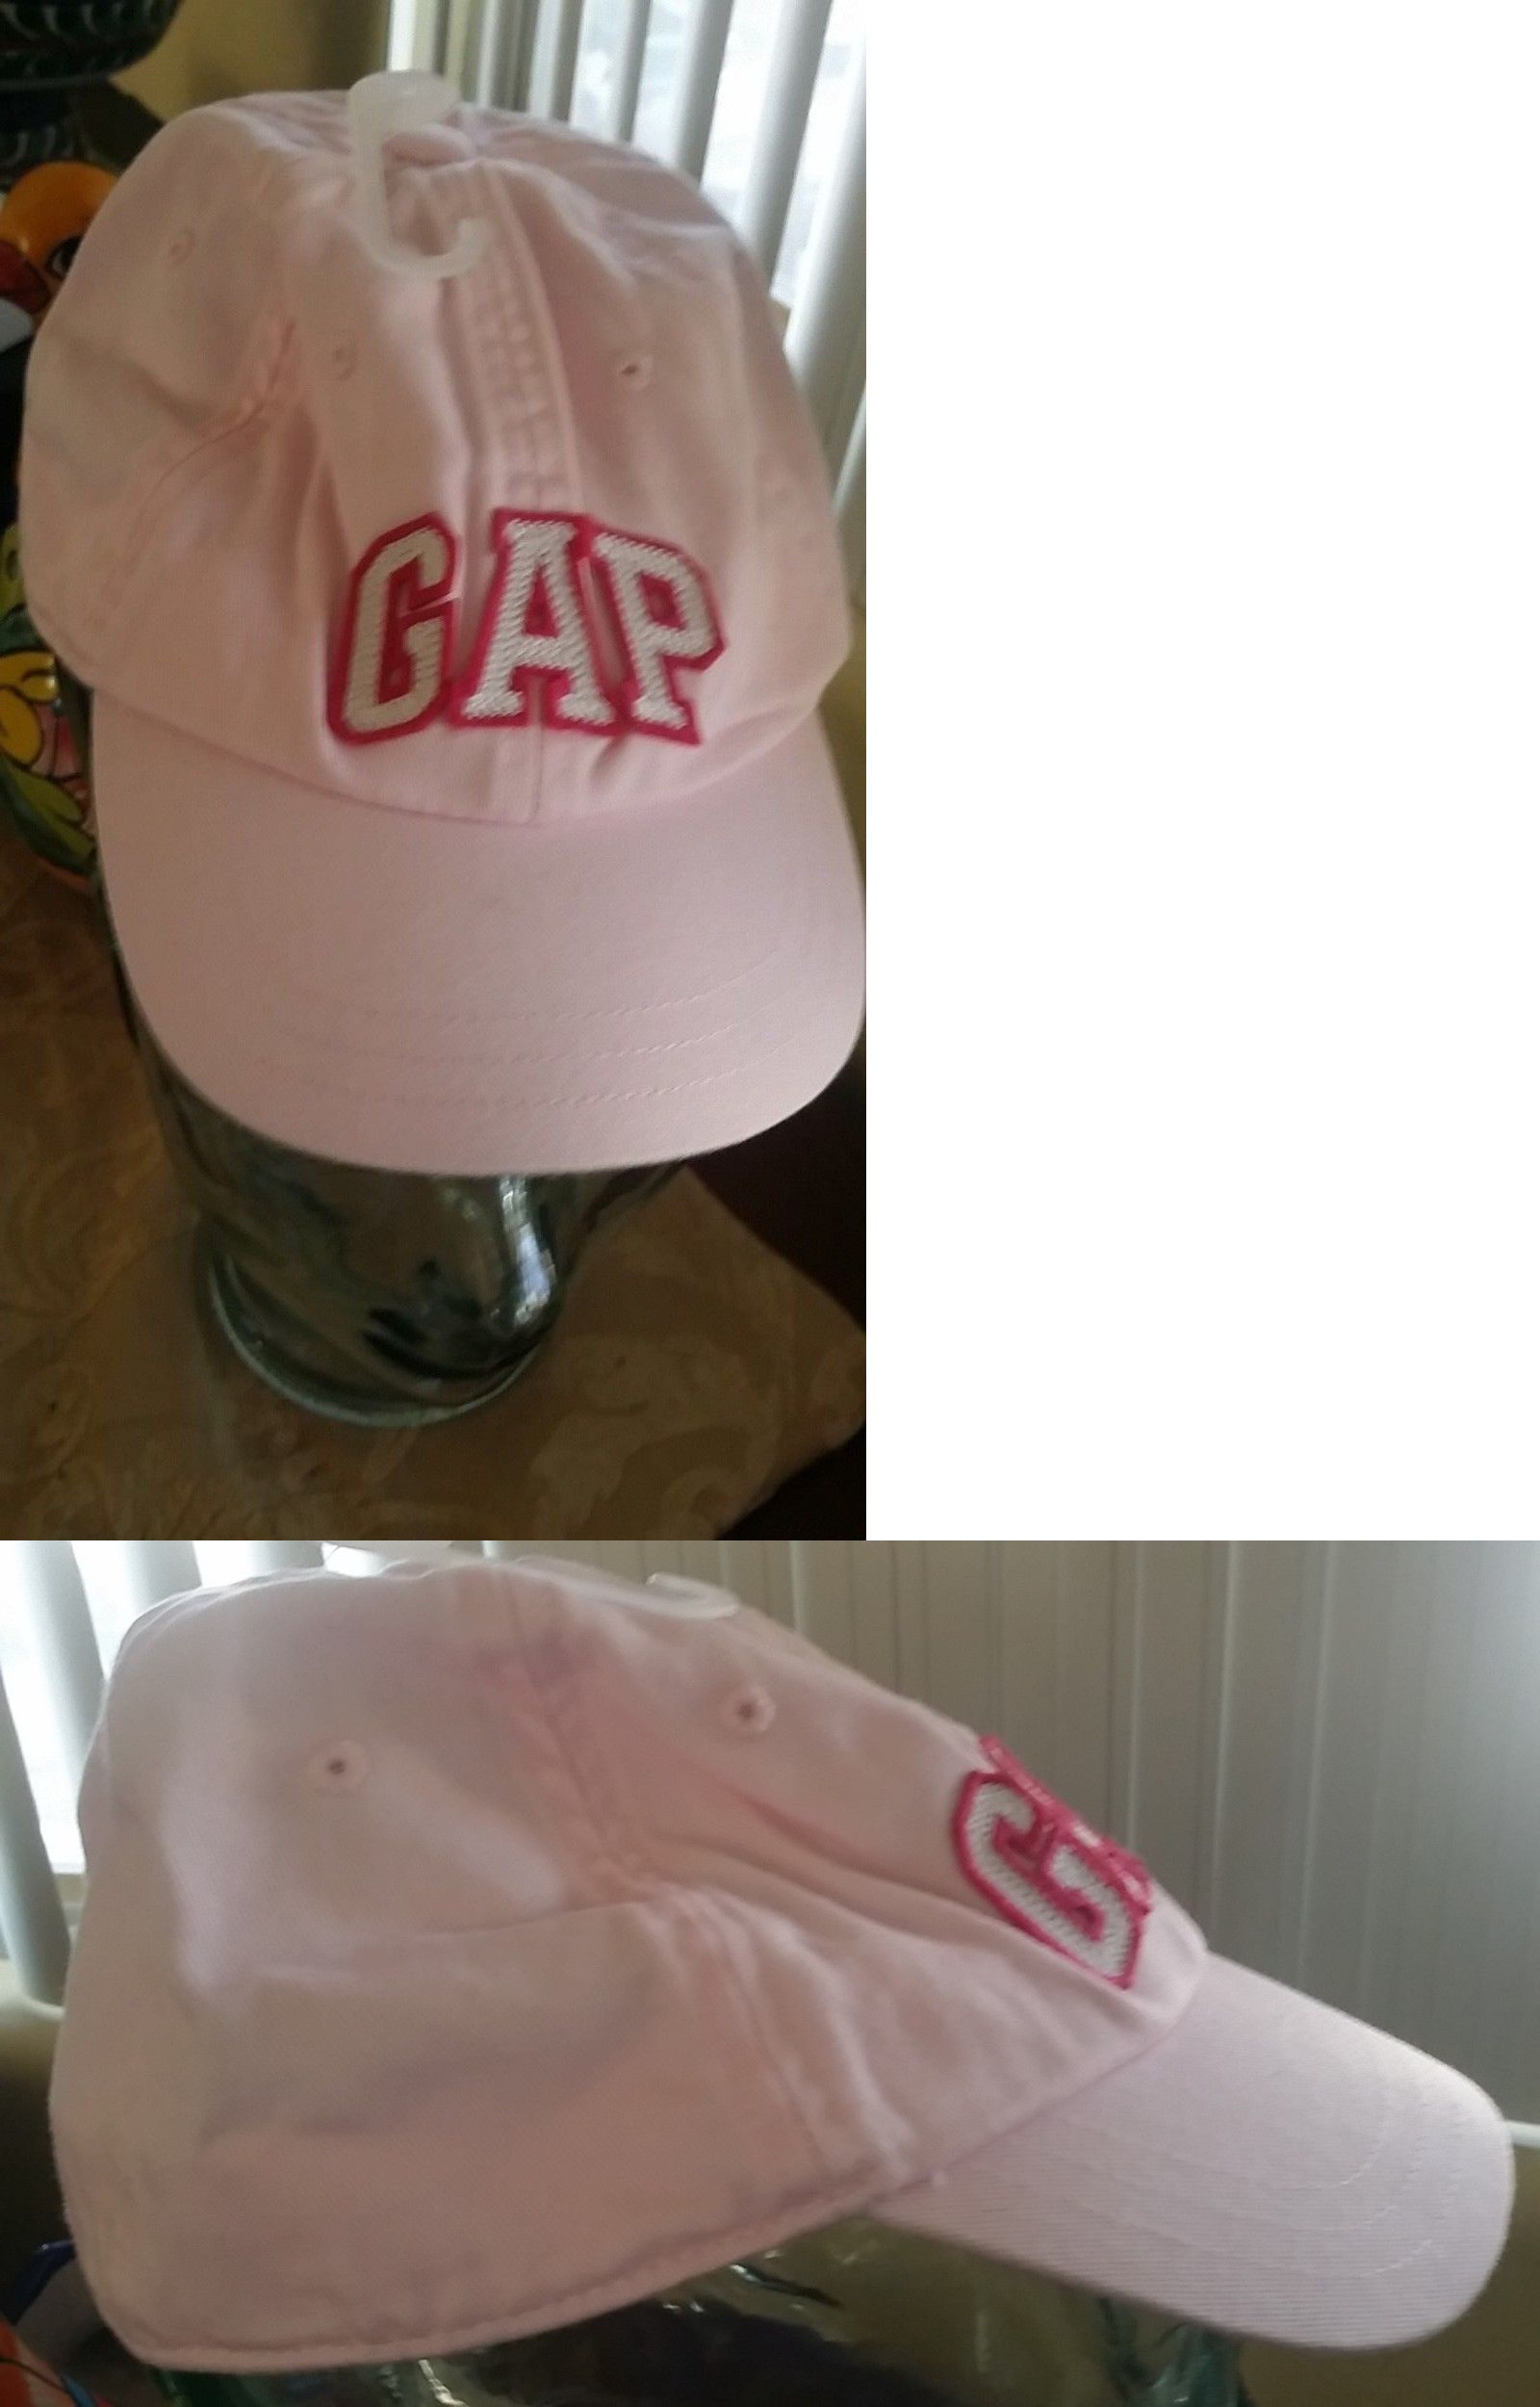 7b12c43c16d21 Hats 163224  New Baby Gap Girls Logo Pink Baseball Hat Cap M L 2-5 Nwt -   BUY IT NOW ONLY   10.5 on  eBay  girls  baseball